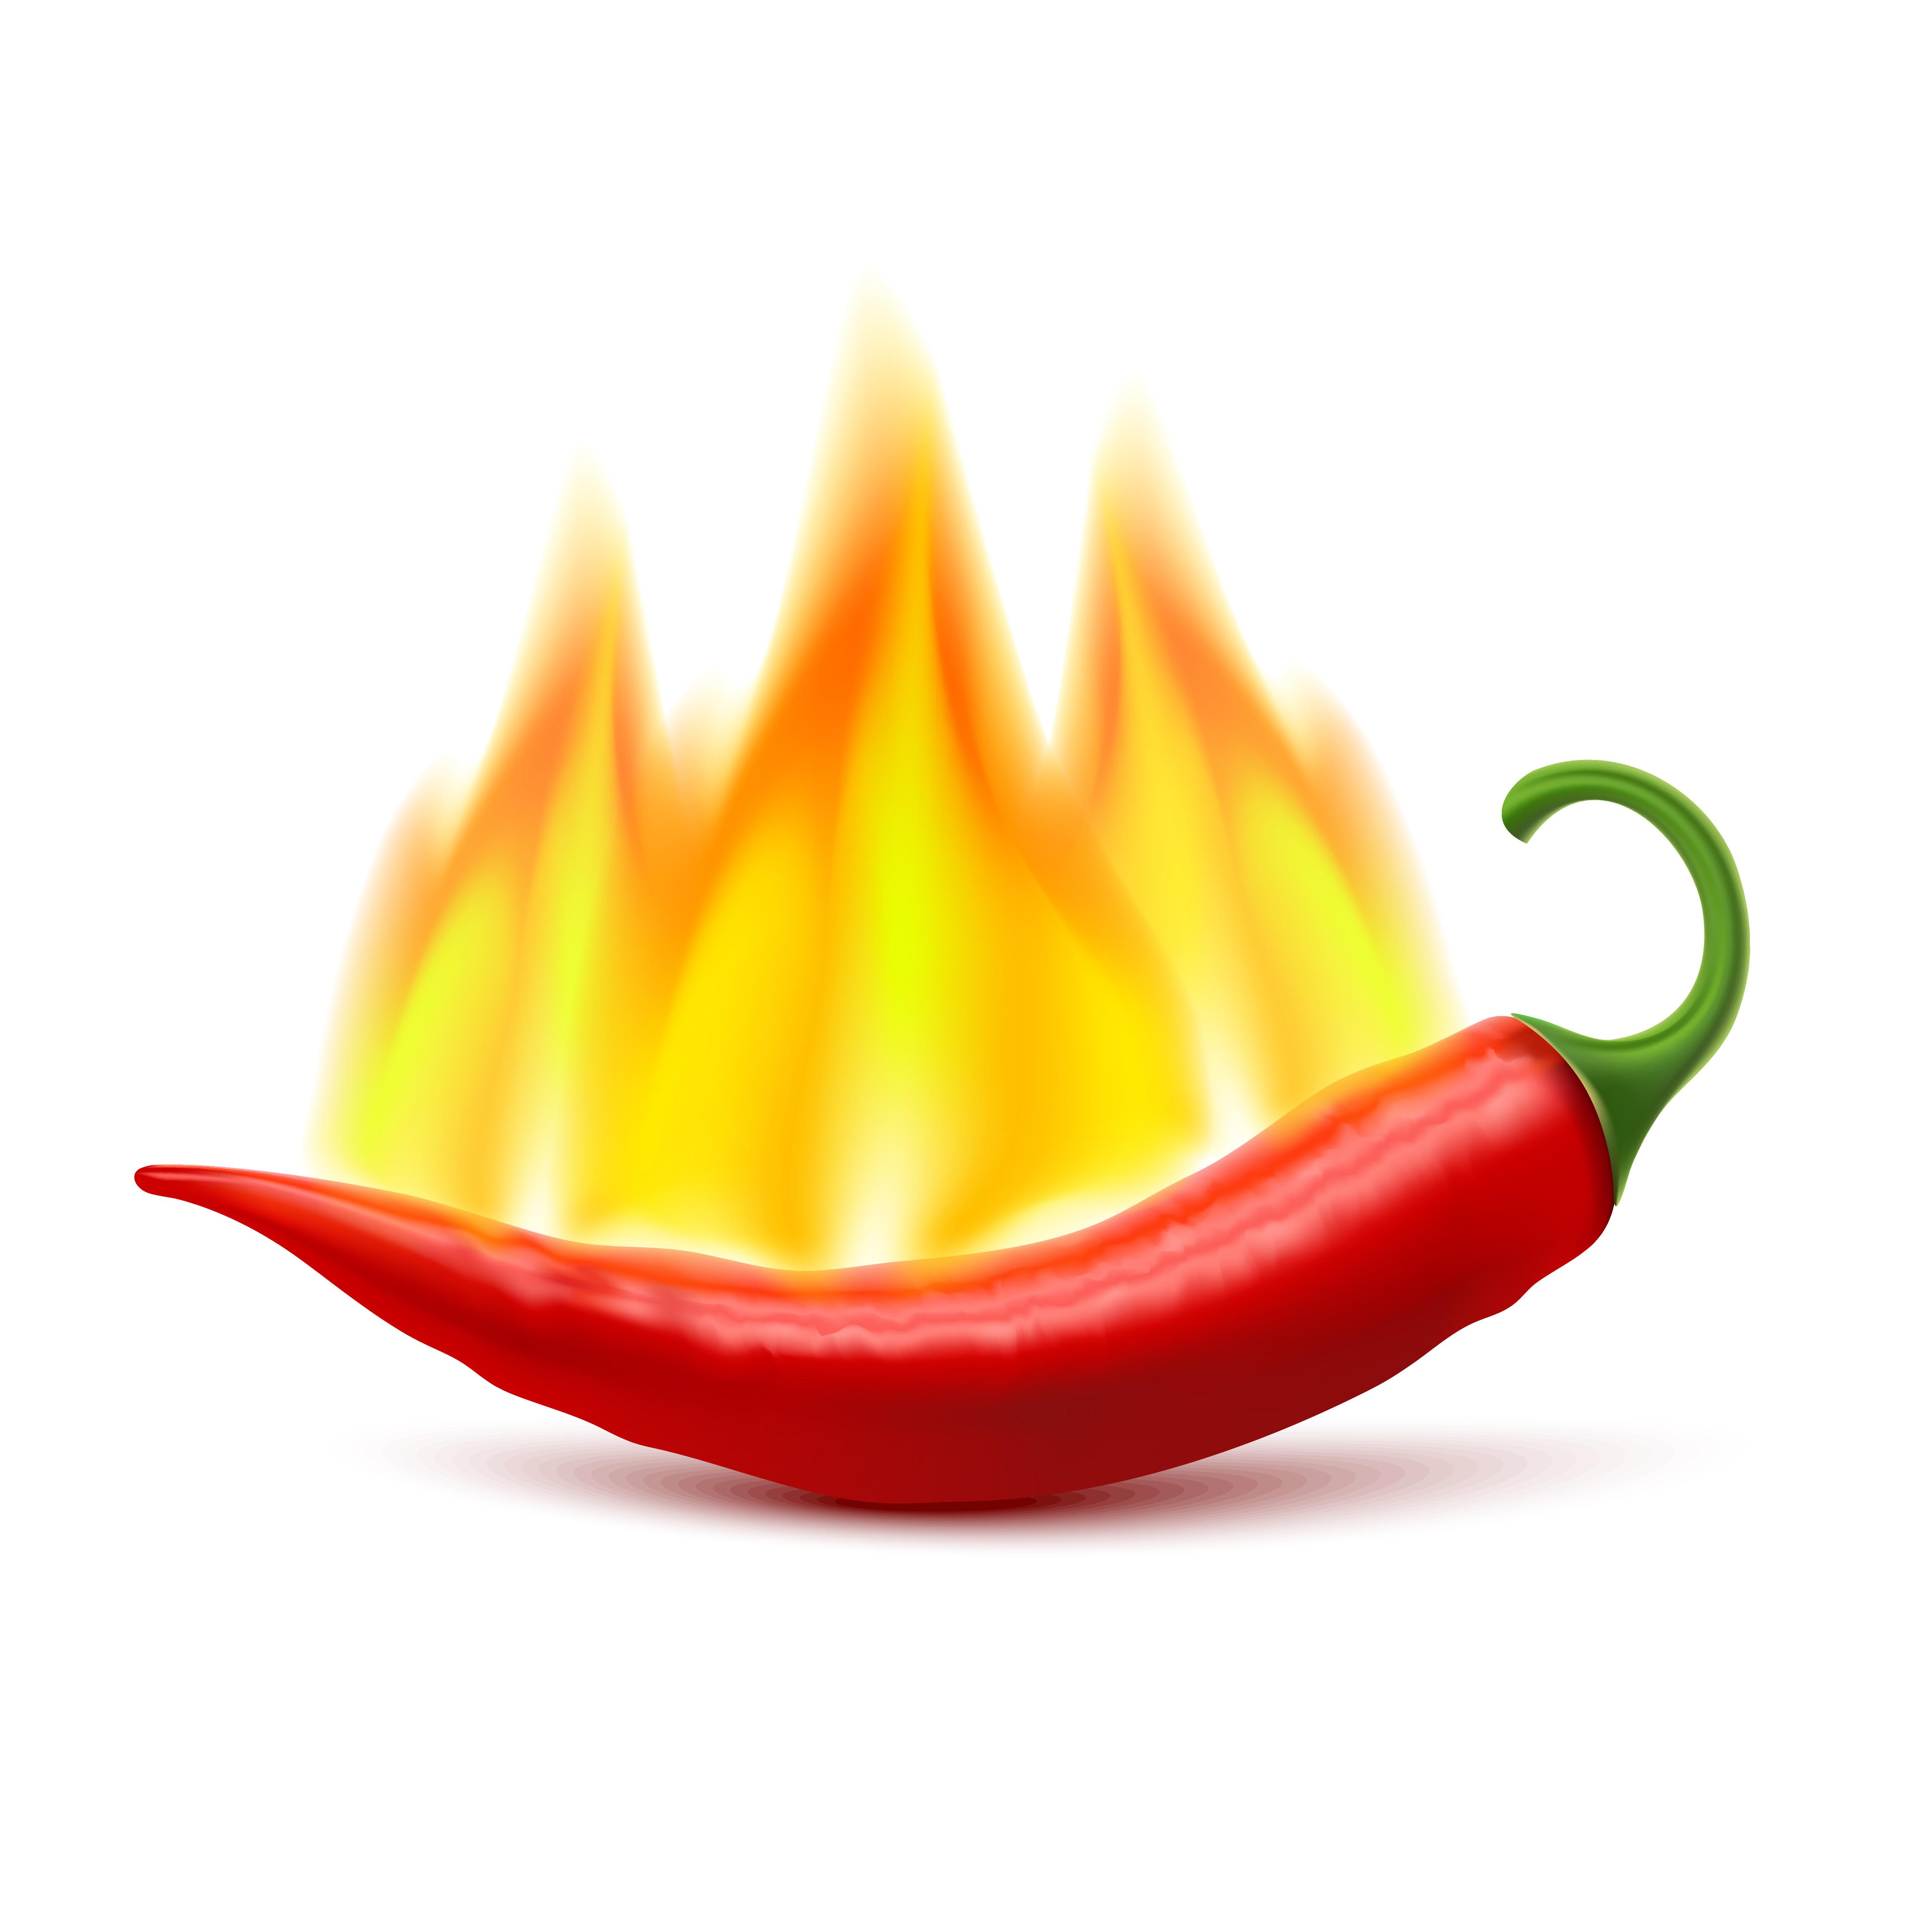 Hot Chili Pepper Game